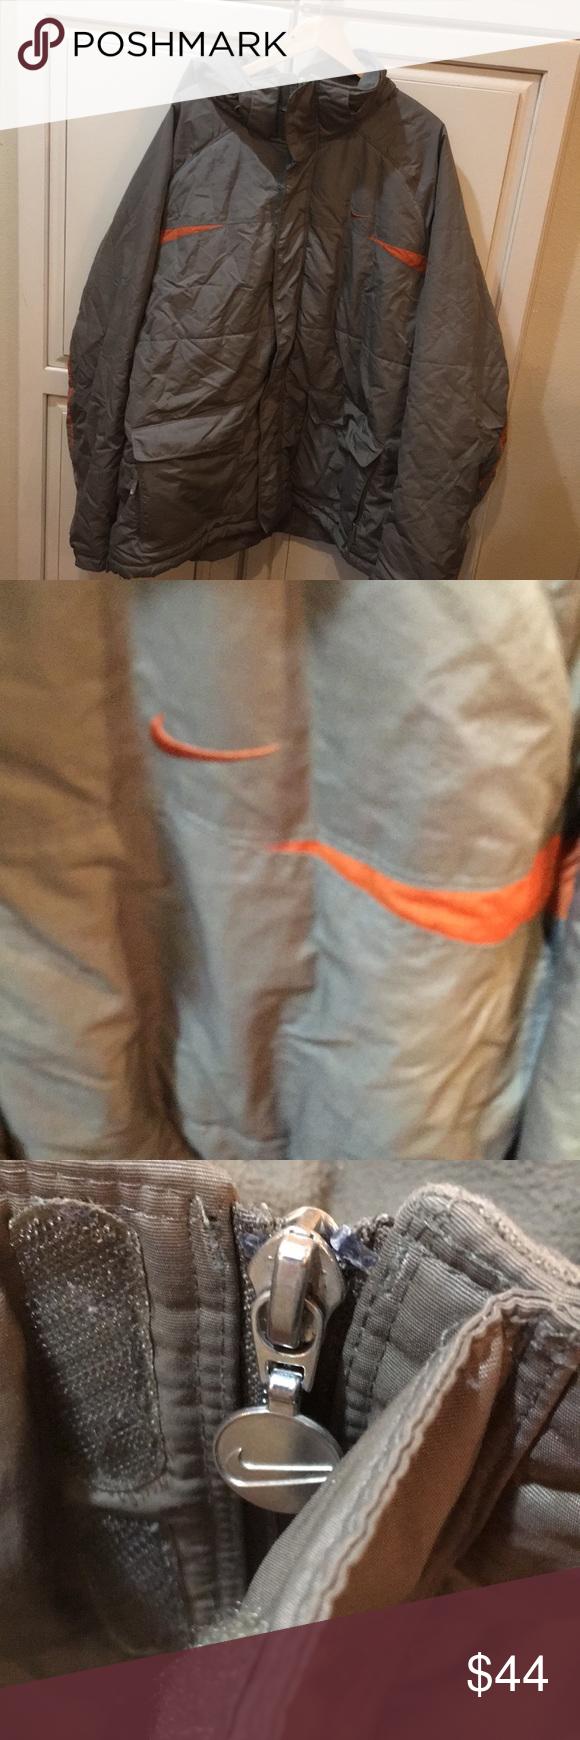 Nike Puffer Jacket 3xl Puffer Jackets Clothes Design Jackets [ 1740 x 580 Pixel ]